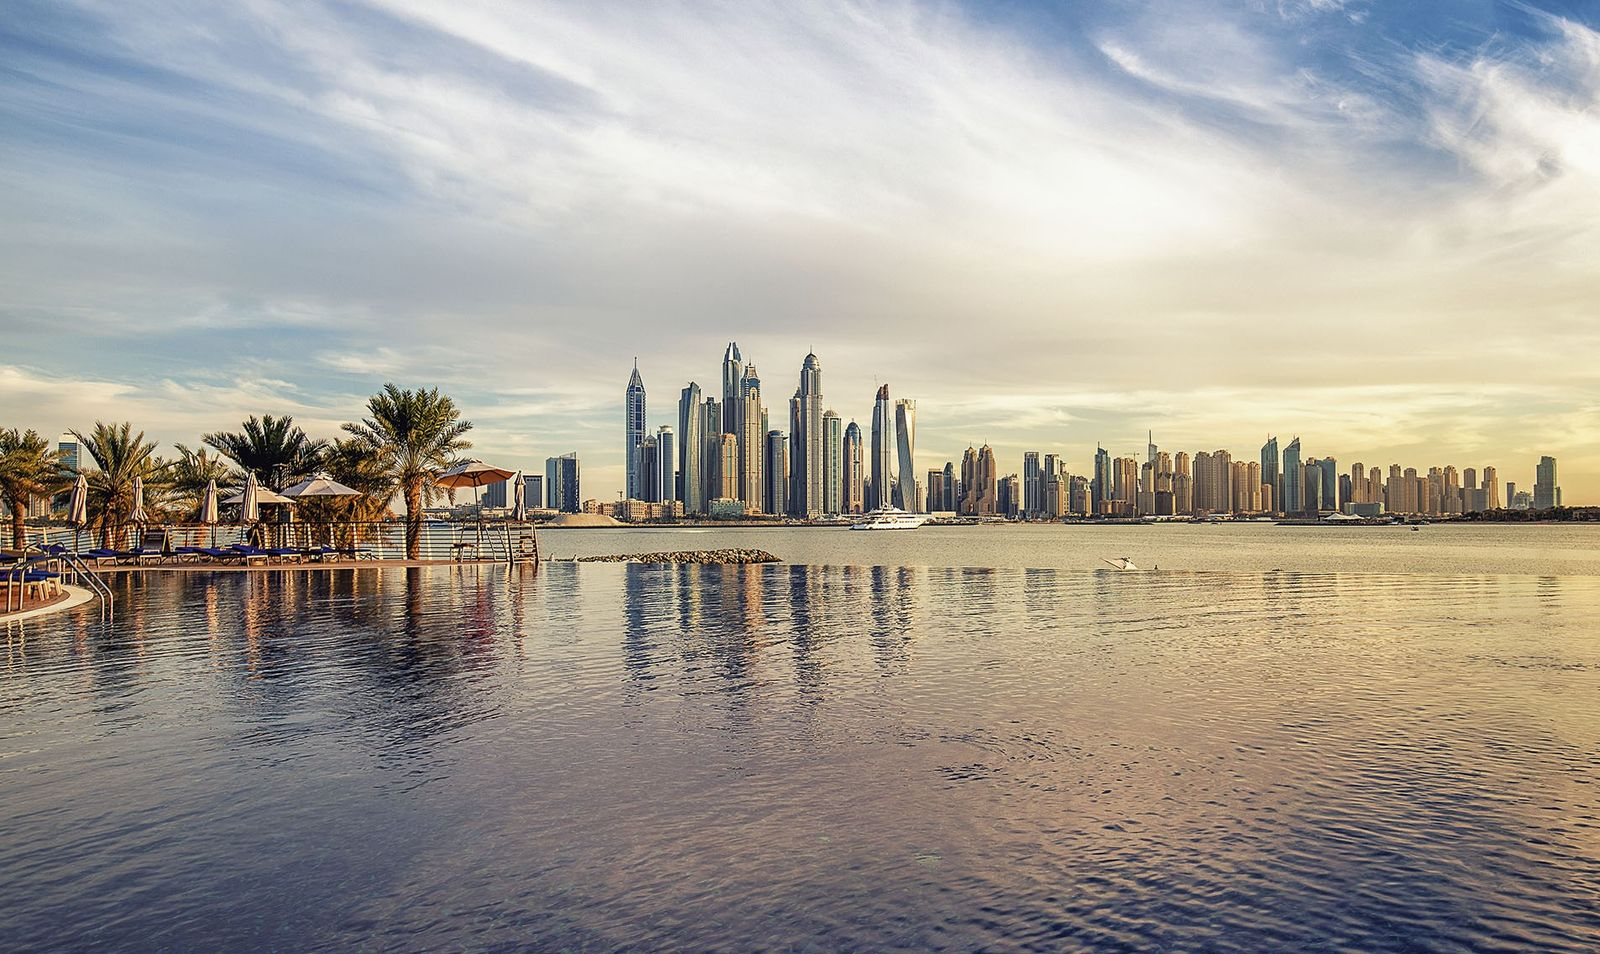 The Dubai skyline rising from the marina at the edge of the desert.